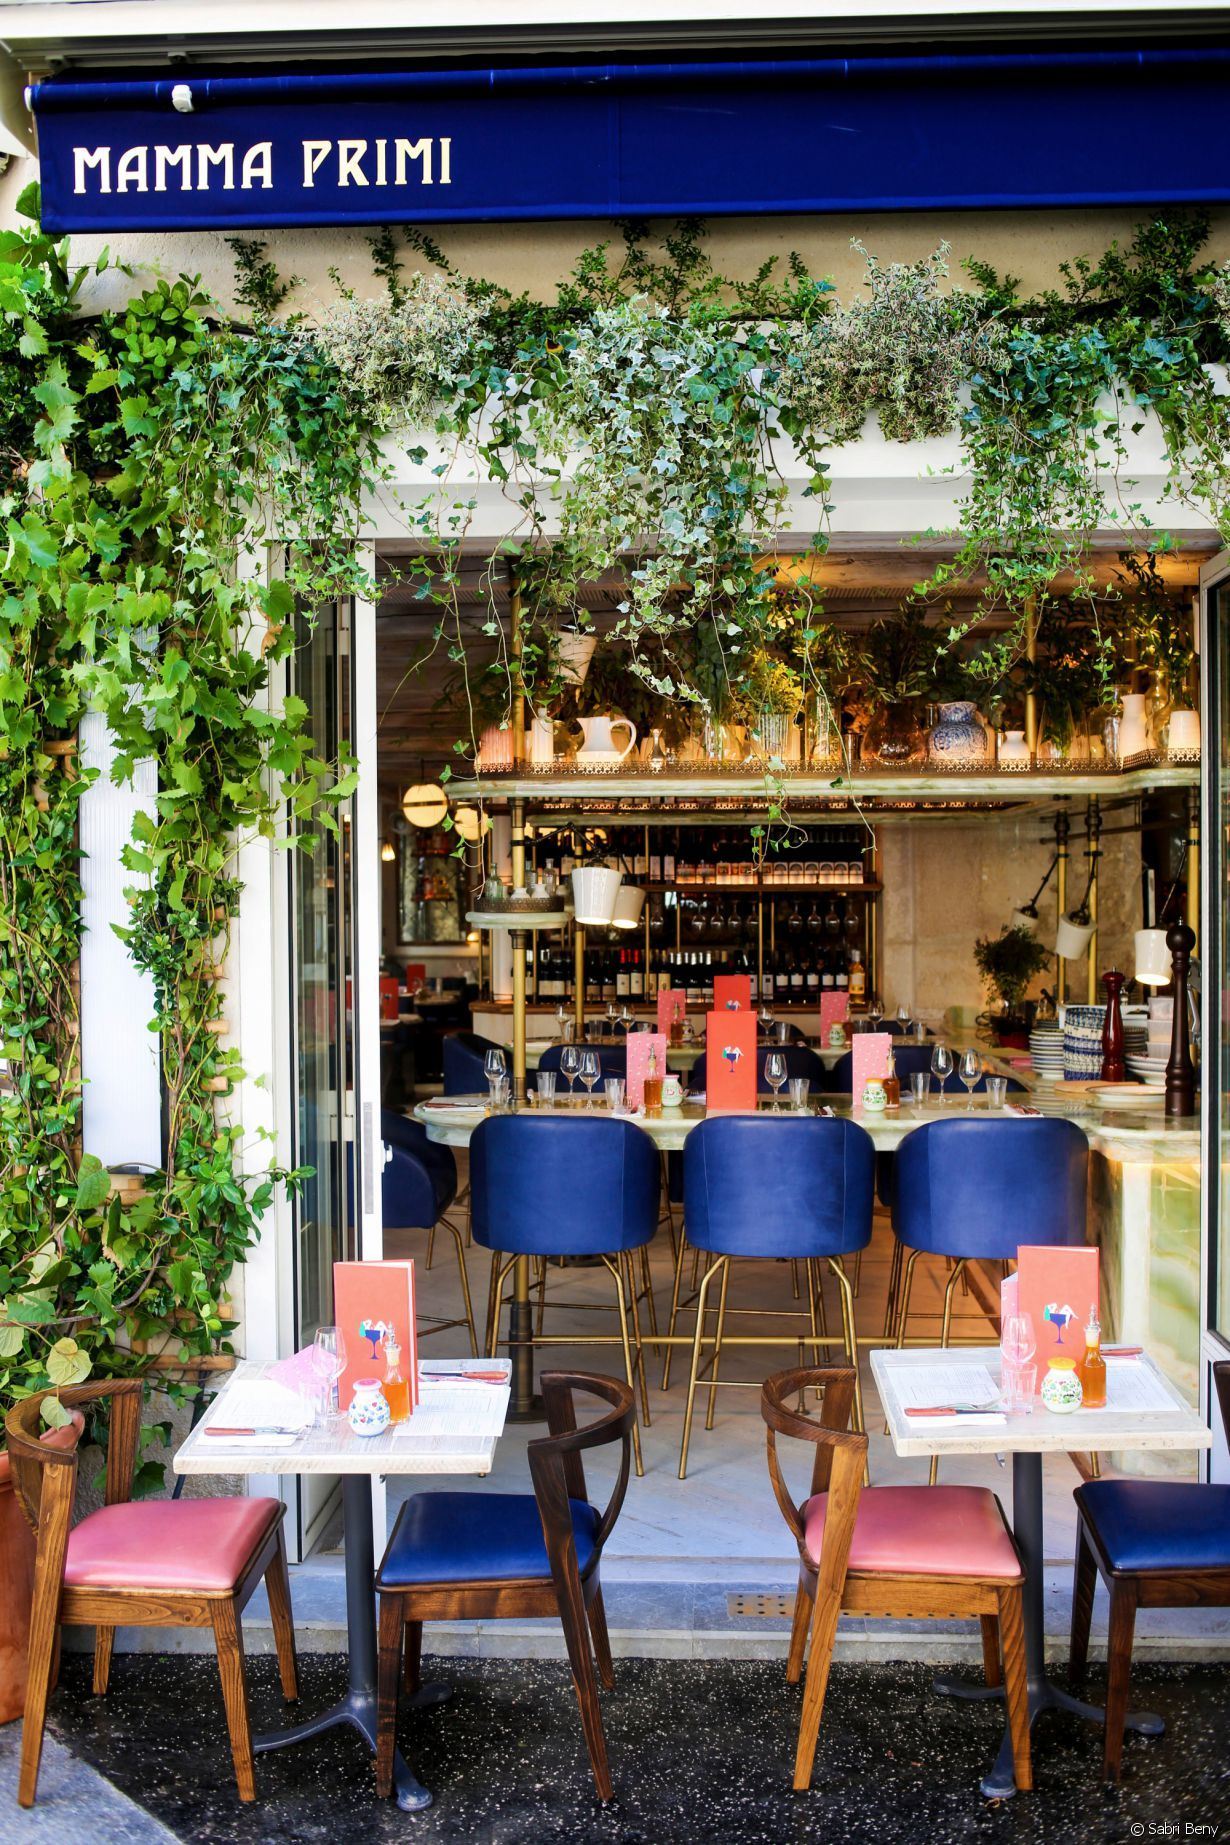 Mamma Primi Cocktails Et Pates Fraiches Le Combo Gagnant Facade Restaurant Decor De Restaurant Italien Resto Paris